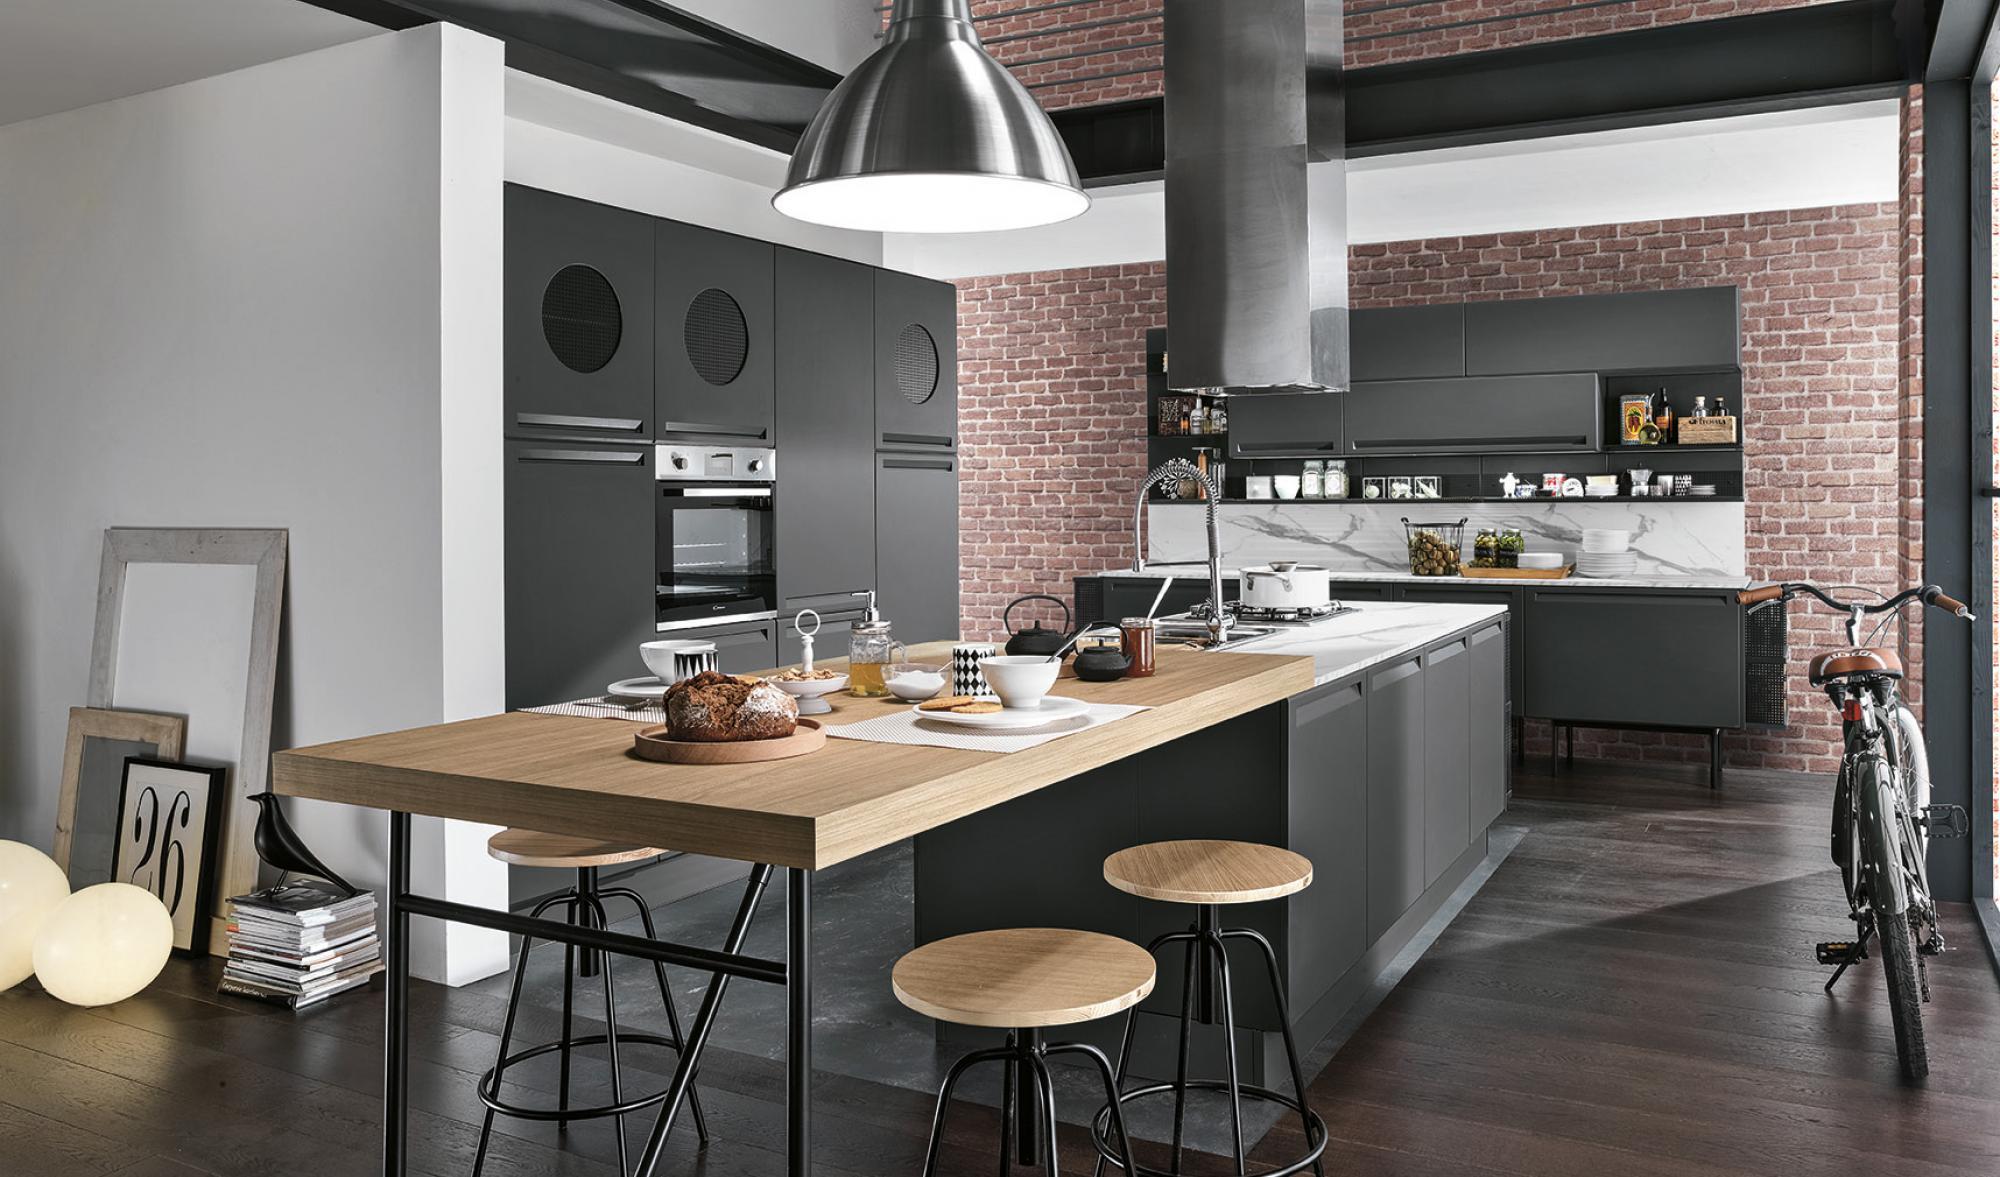 Isla - Kitchens - Modern Kitchens - Colombini Casa - Black - Wood